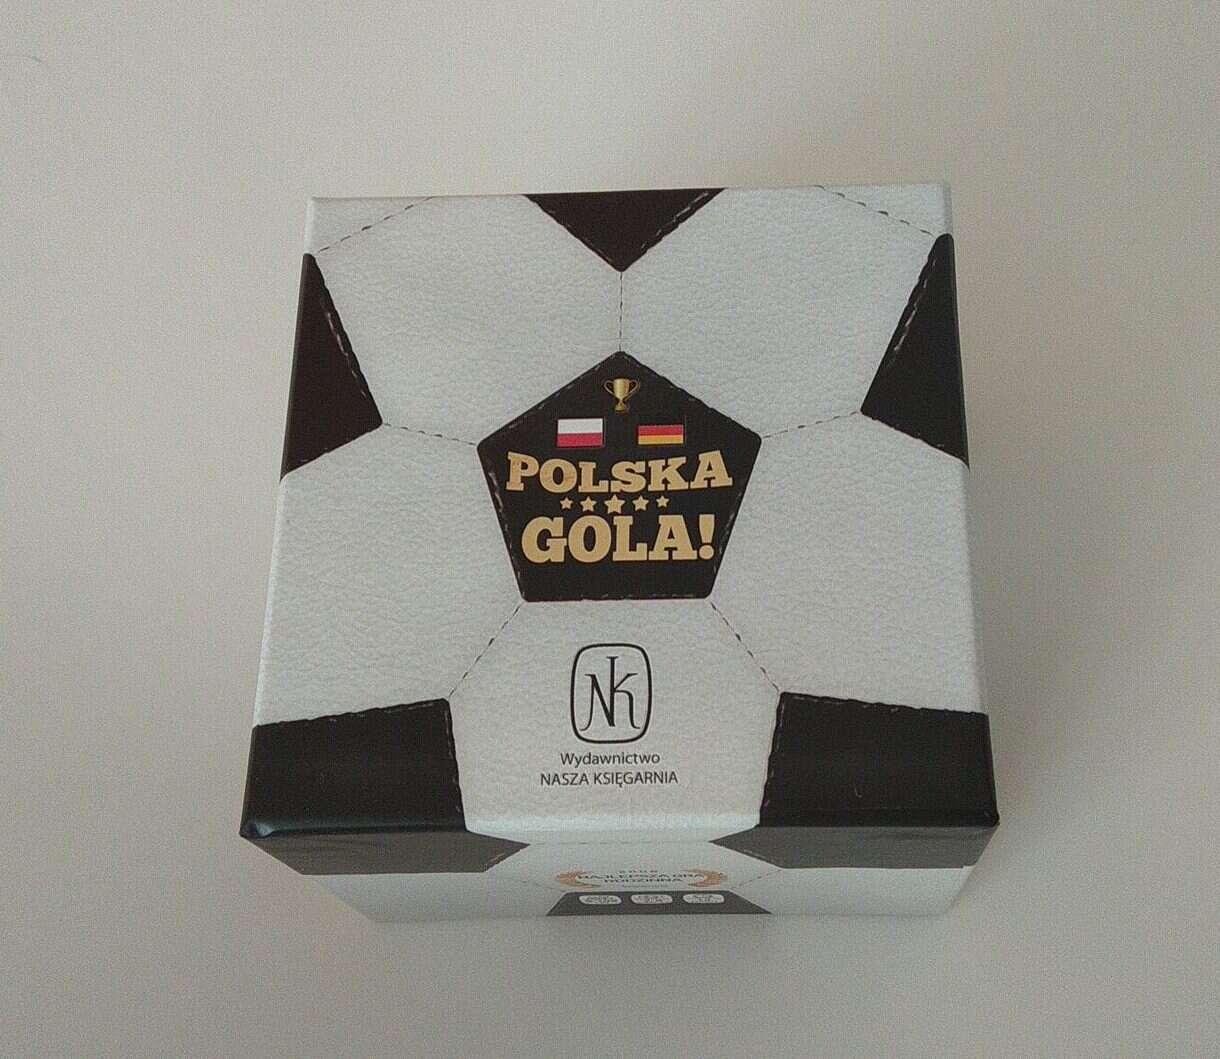 Polska, Gola! pudło